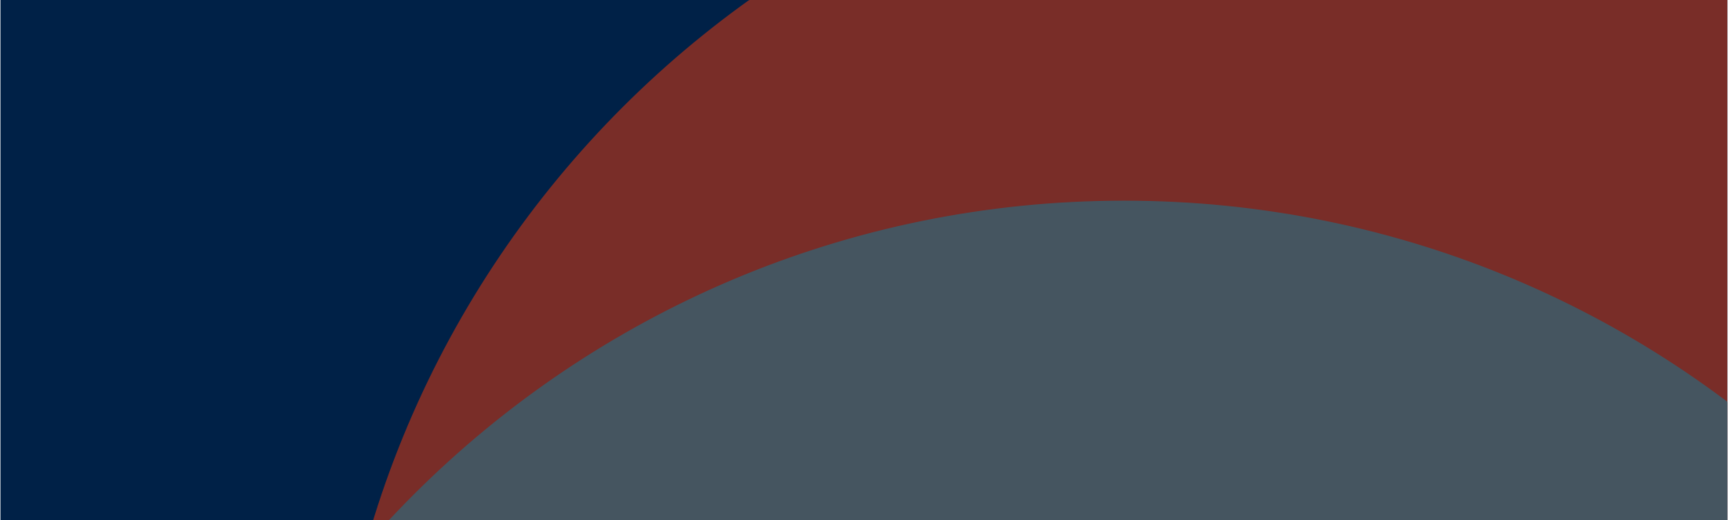 blue red grey box